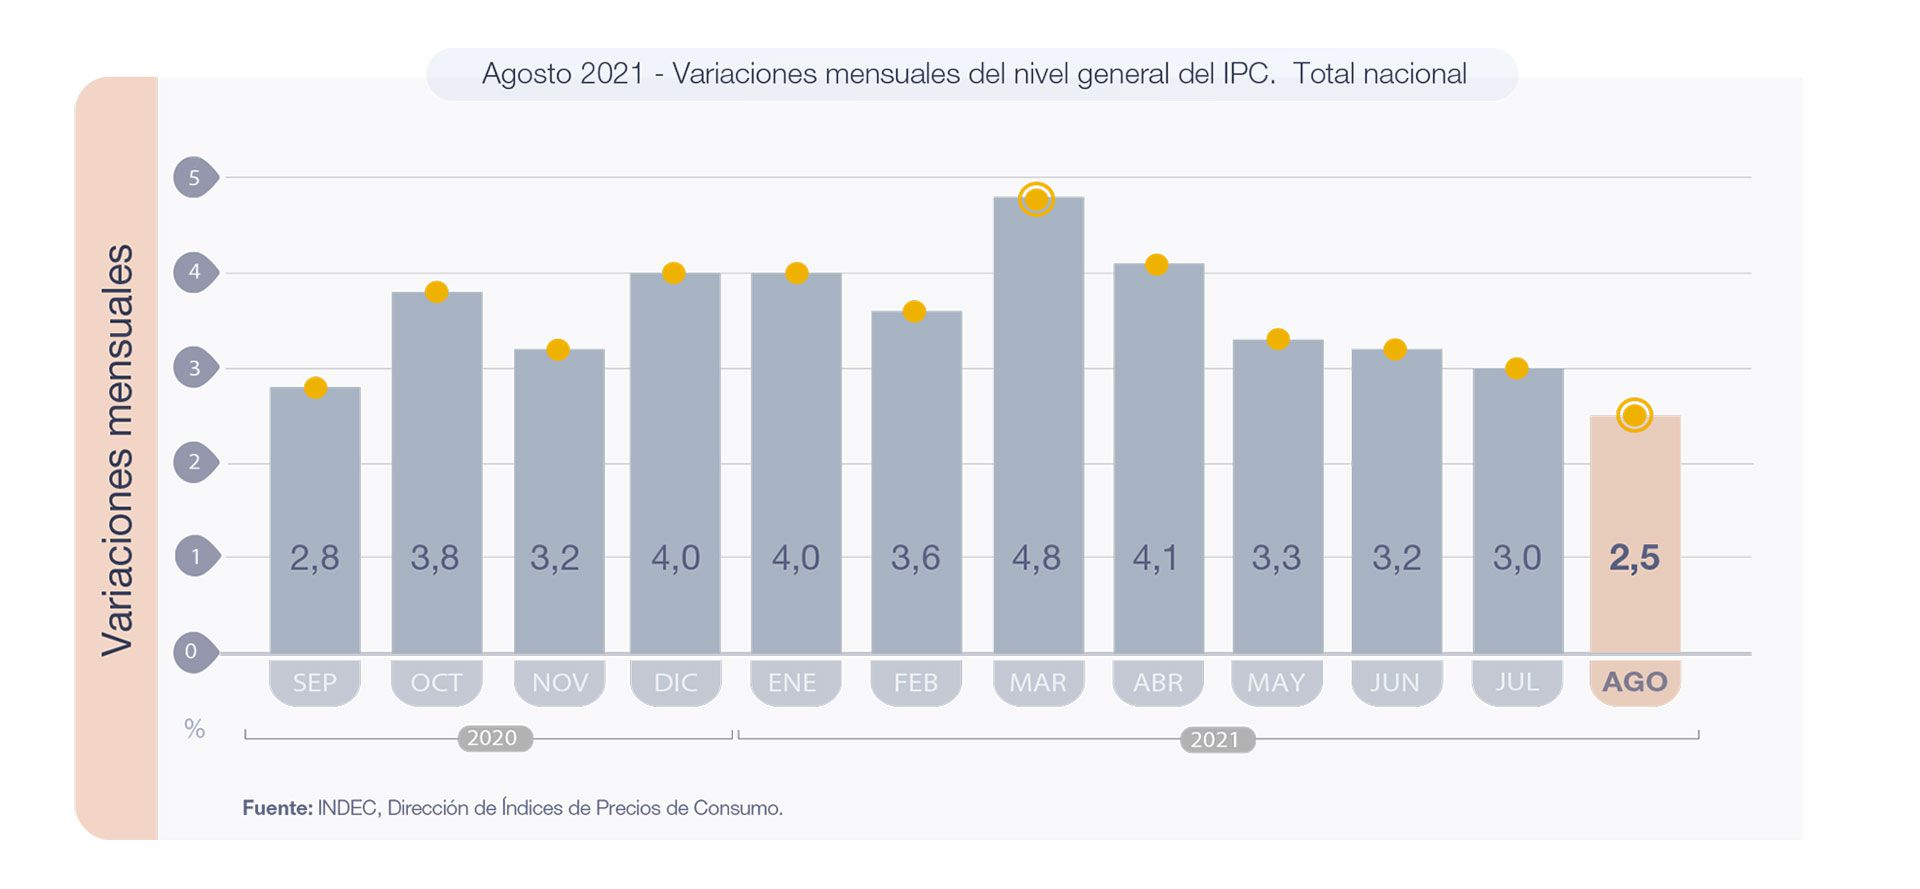 Agosto 2021 - Variaciones mensuales del nivel general del IPC. Total nacional